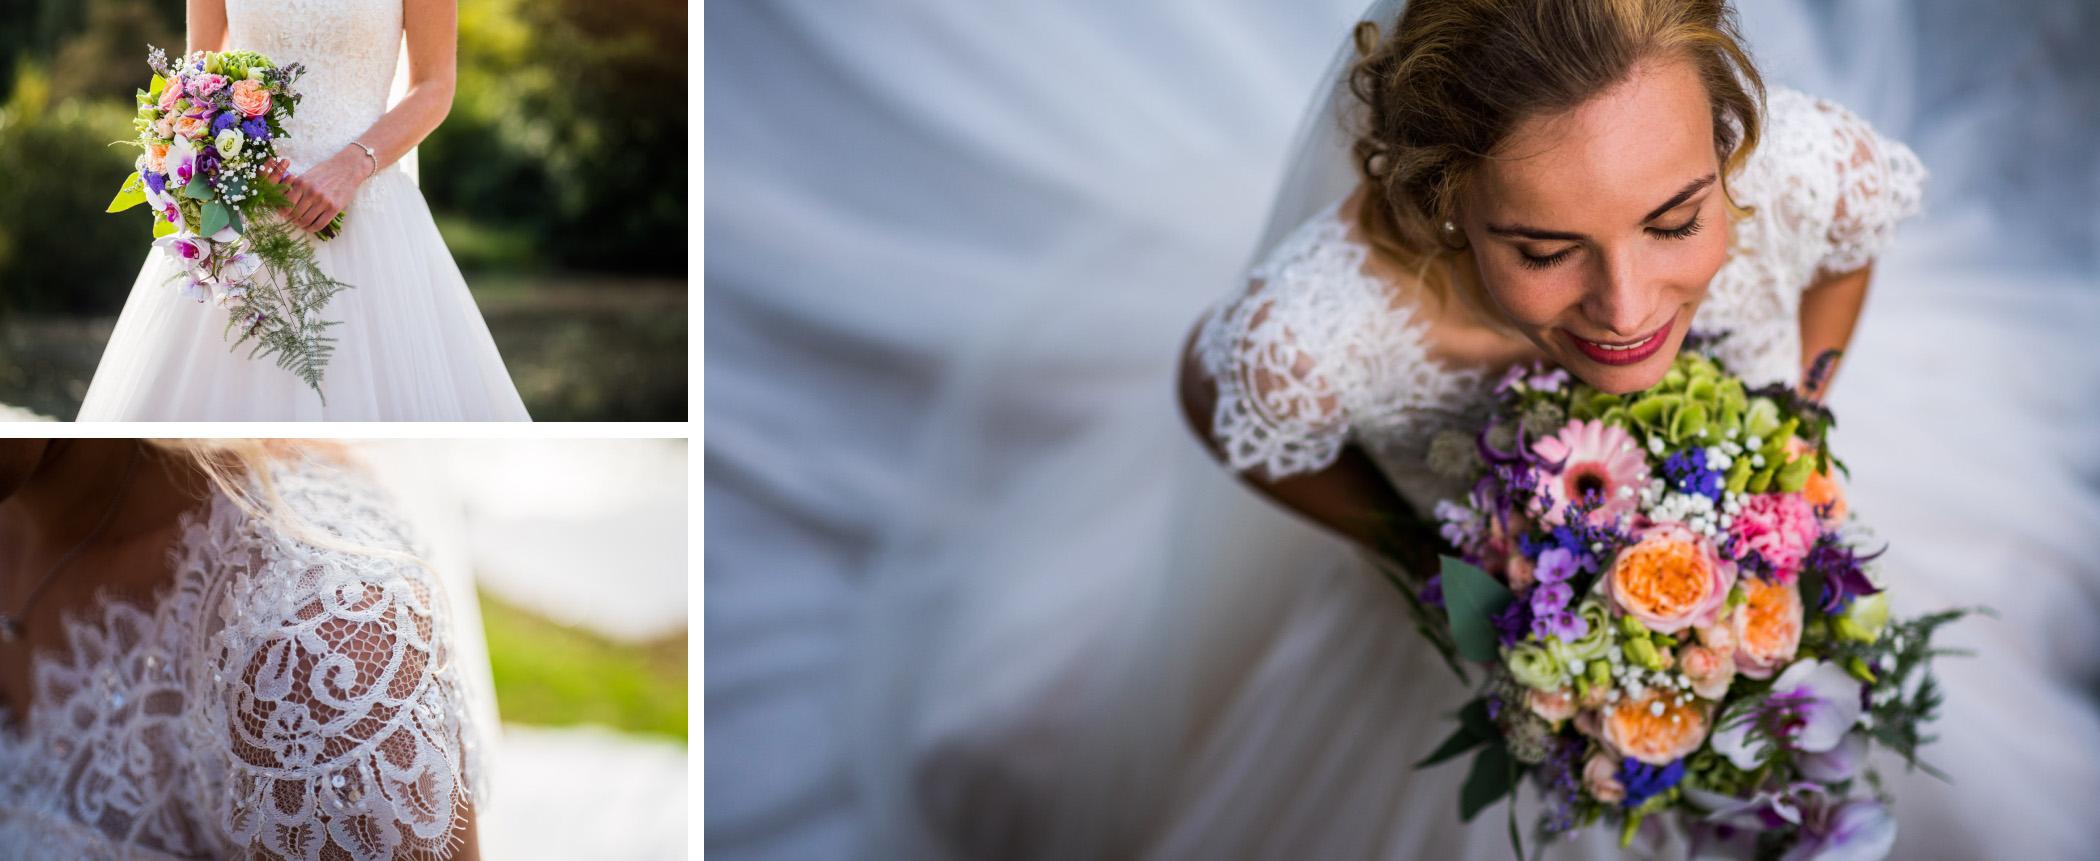 bruidsfotografie Kasteel ter Horst